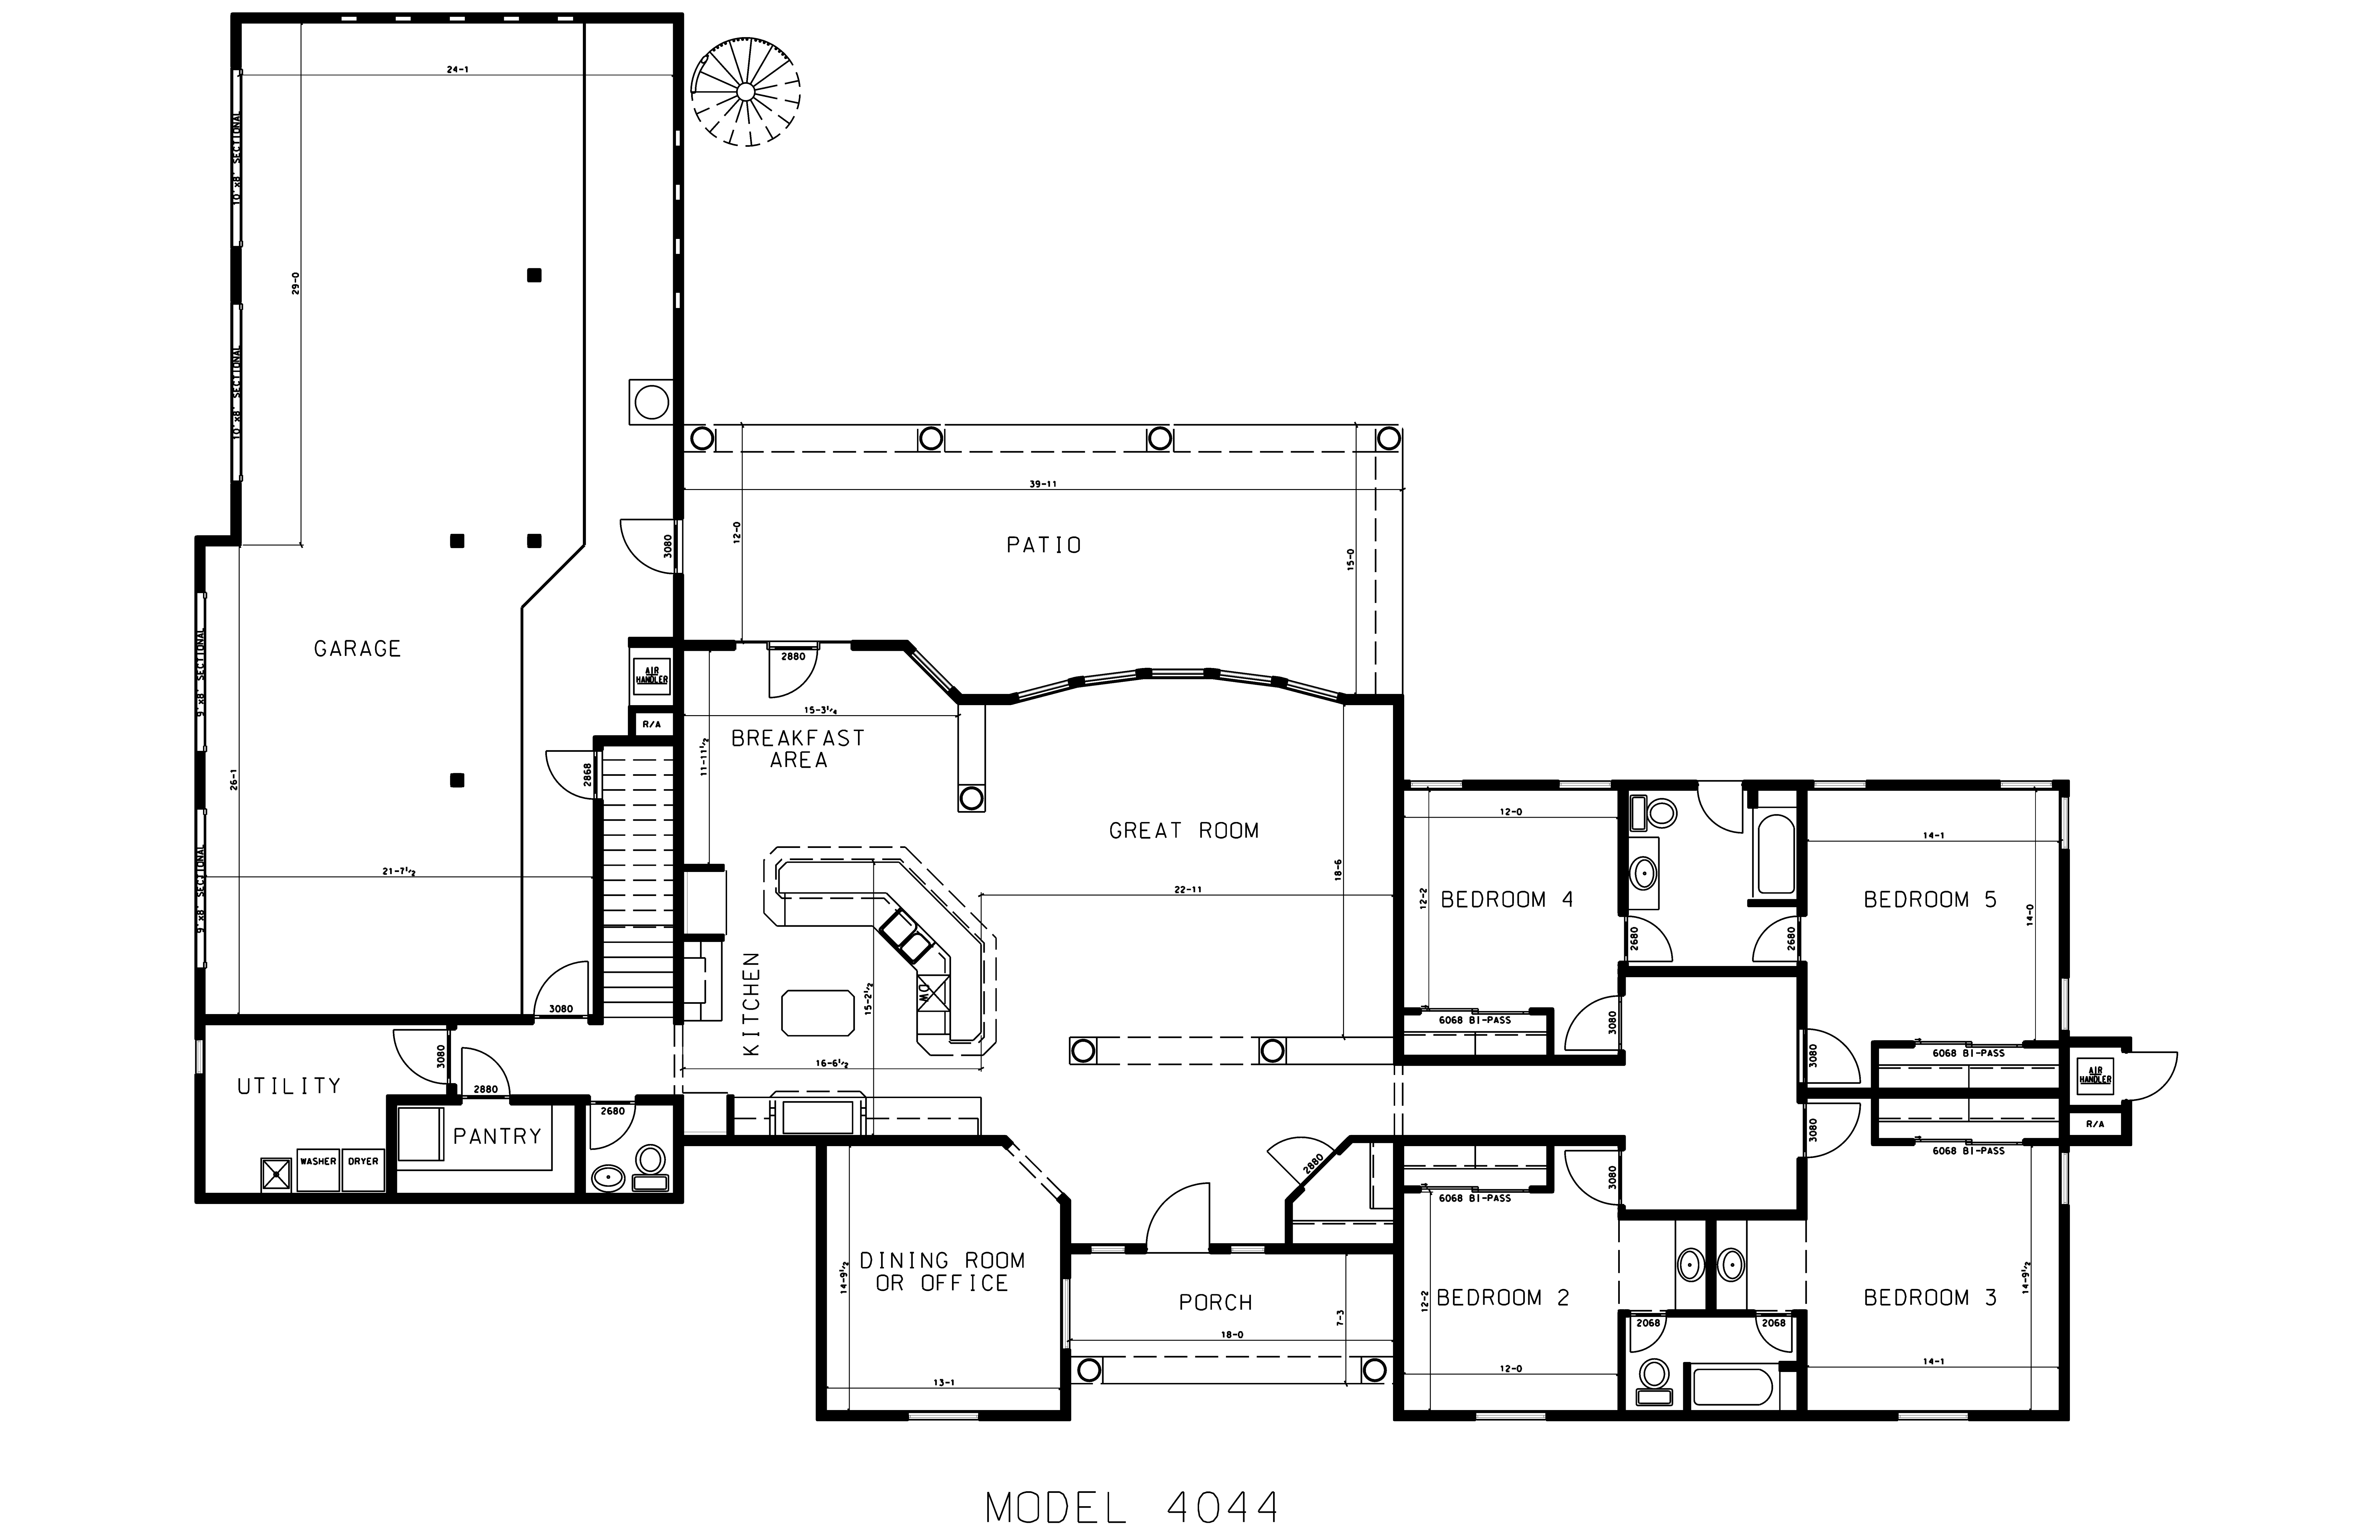 Arizona House Plans Smalltowndjs House Plans 147832